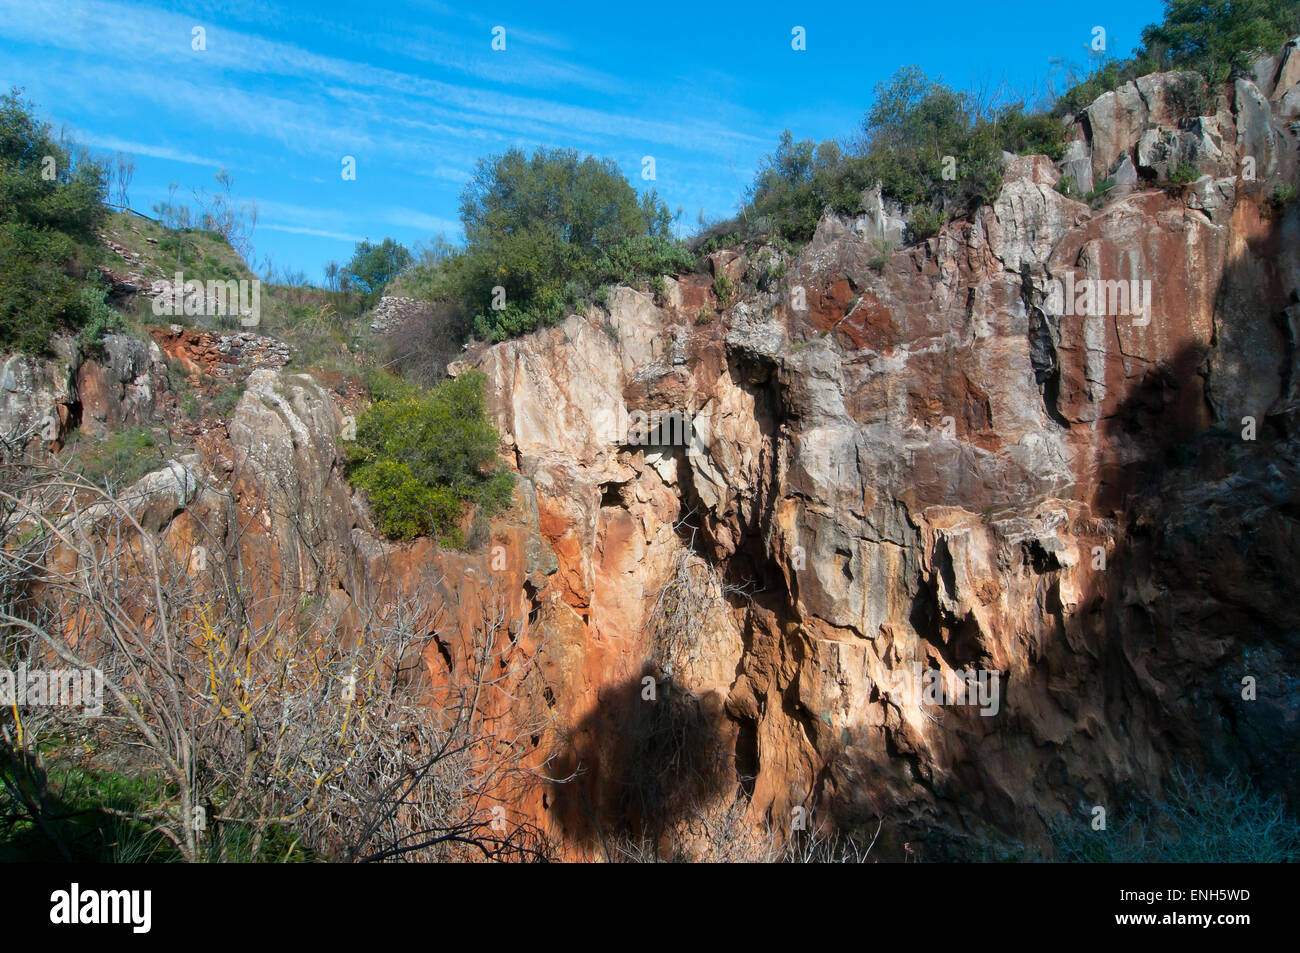 Natural monument -Mina La Jayona-, Fuente del Arco, Badajoz province, Region of Extremadura, Spain, Europe Stock Photo